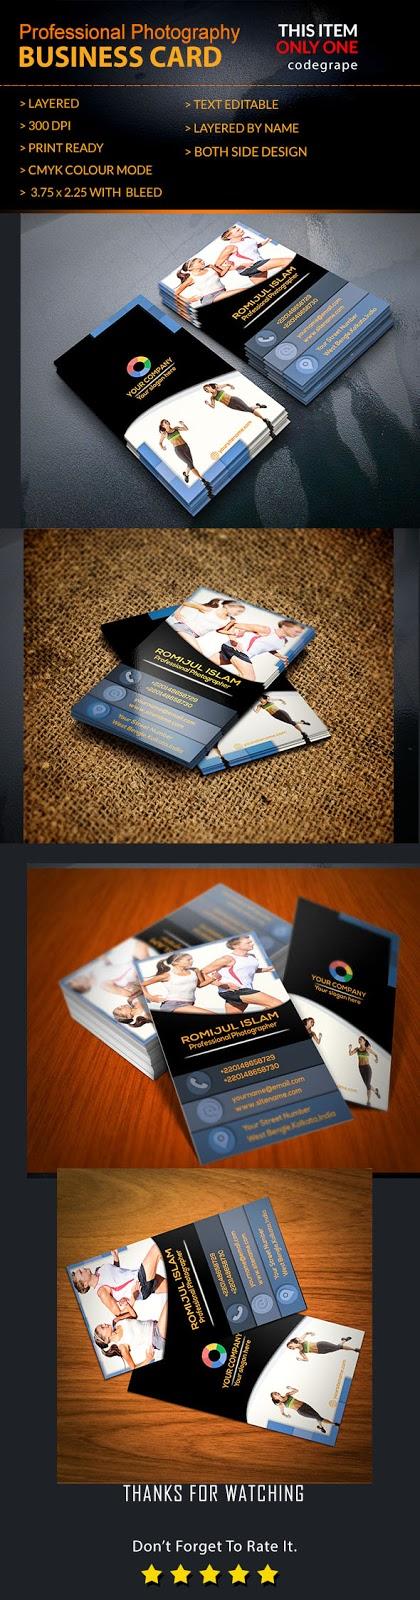 https://www.codegrape.com/item/photography-business-card/14279